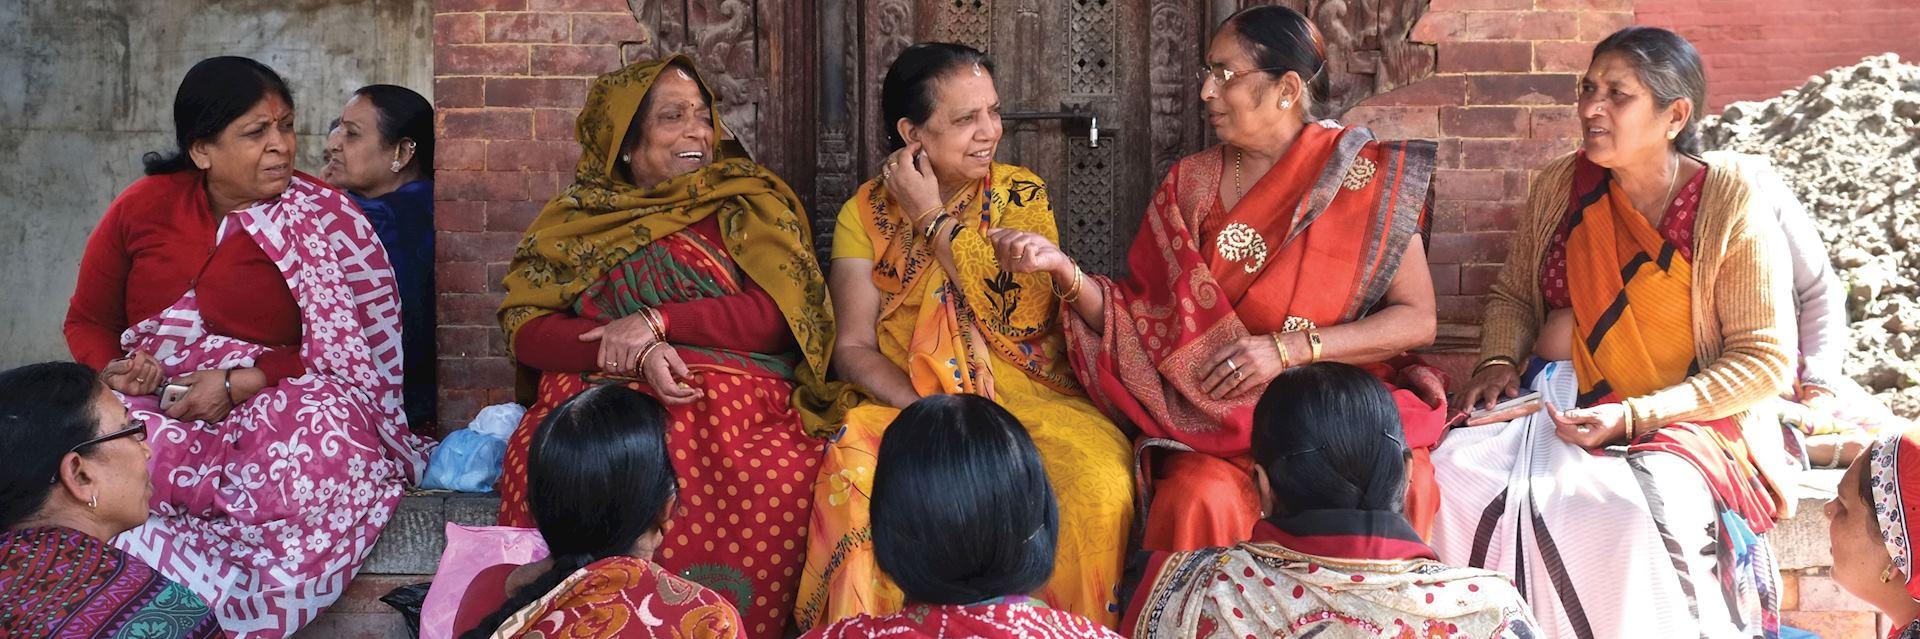 Women in Durbar Square, Kathmandu